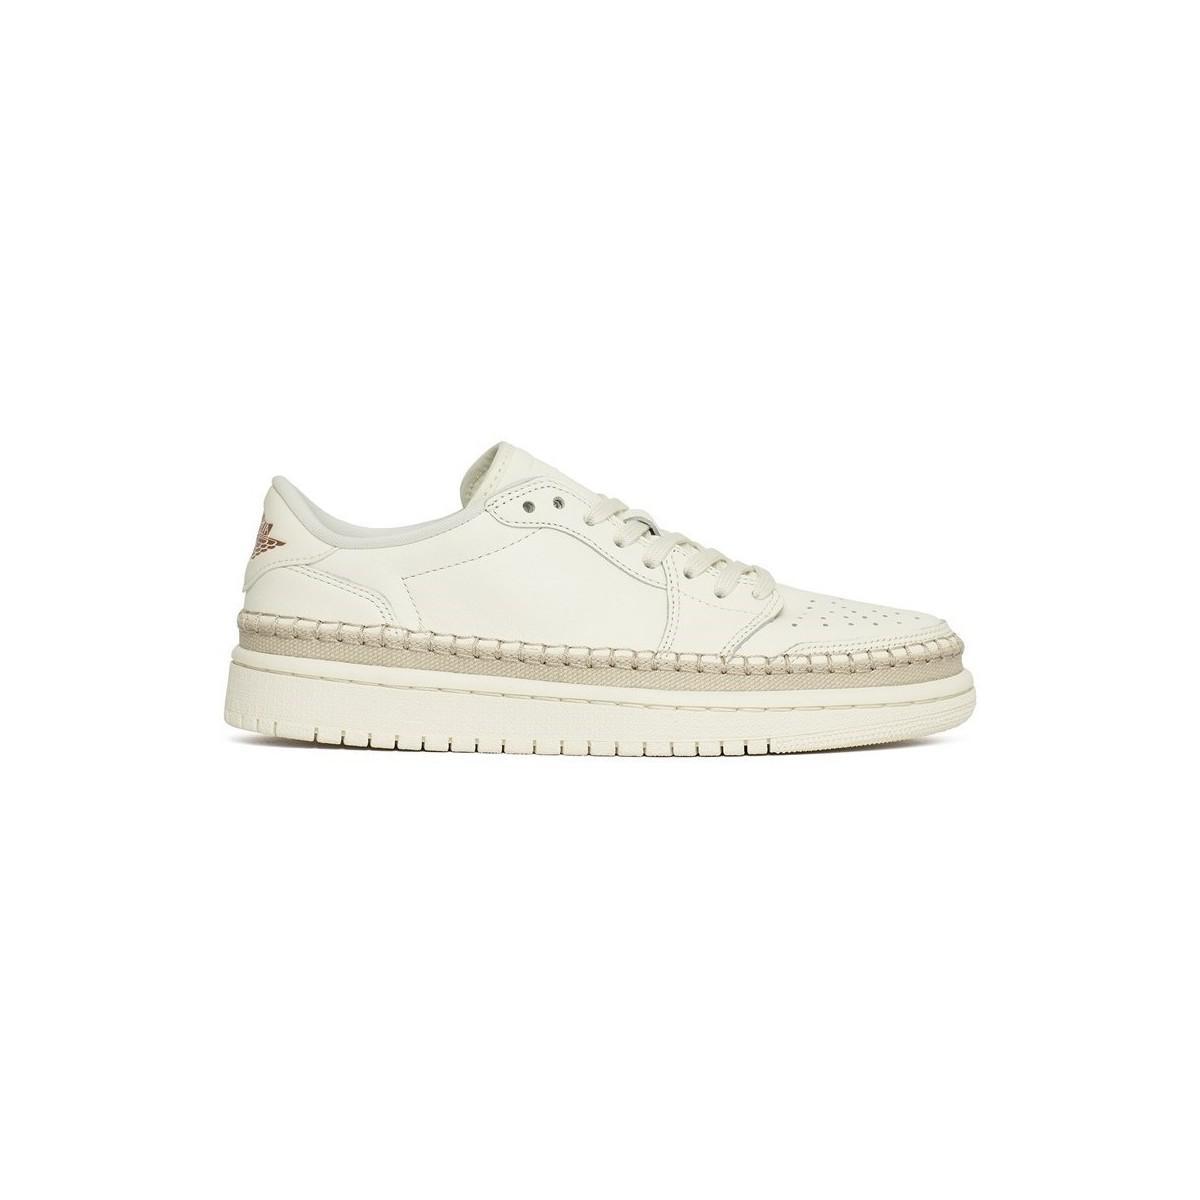 815982d8eae Nike Wmns Air Jordan 1 Retro Low Ns Women's Shoes (trainers) In ...